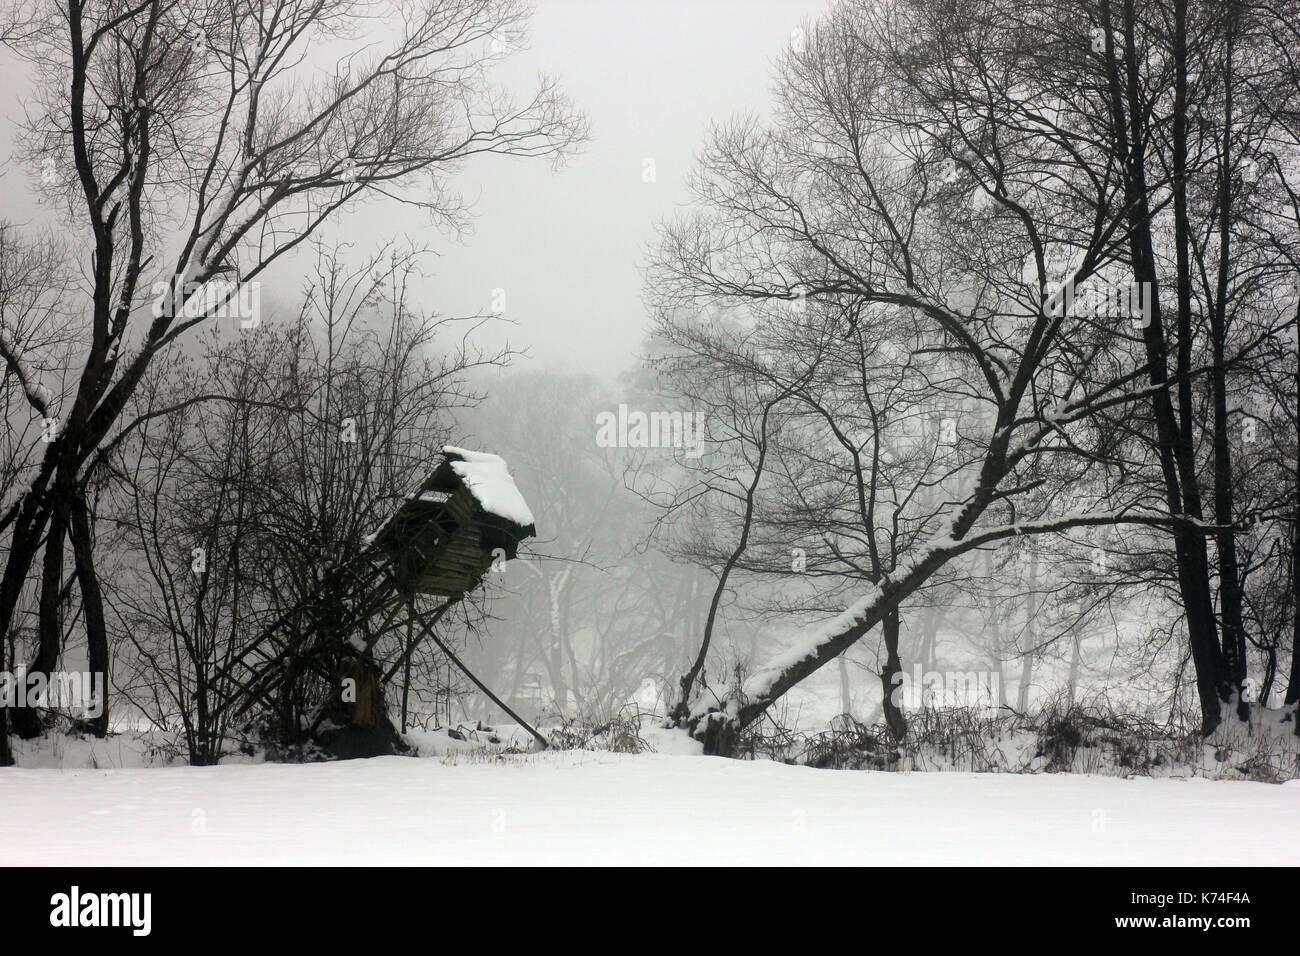 Jagd, hunting, - Stock Image